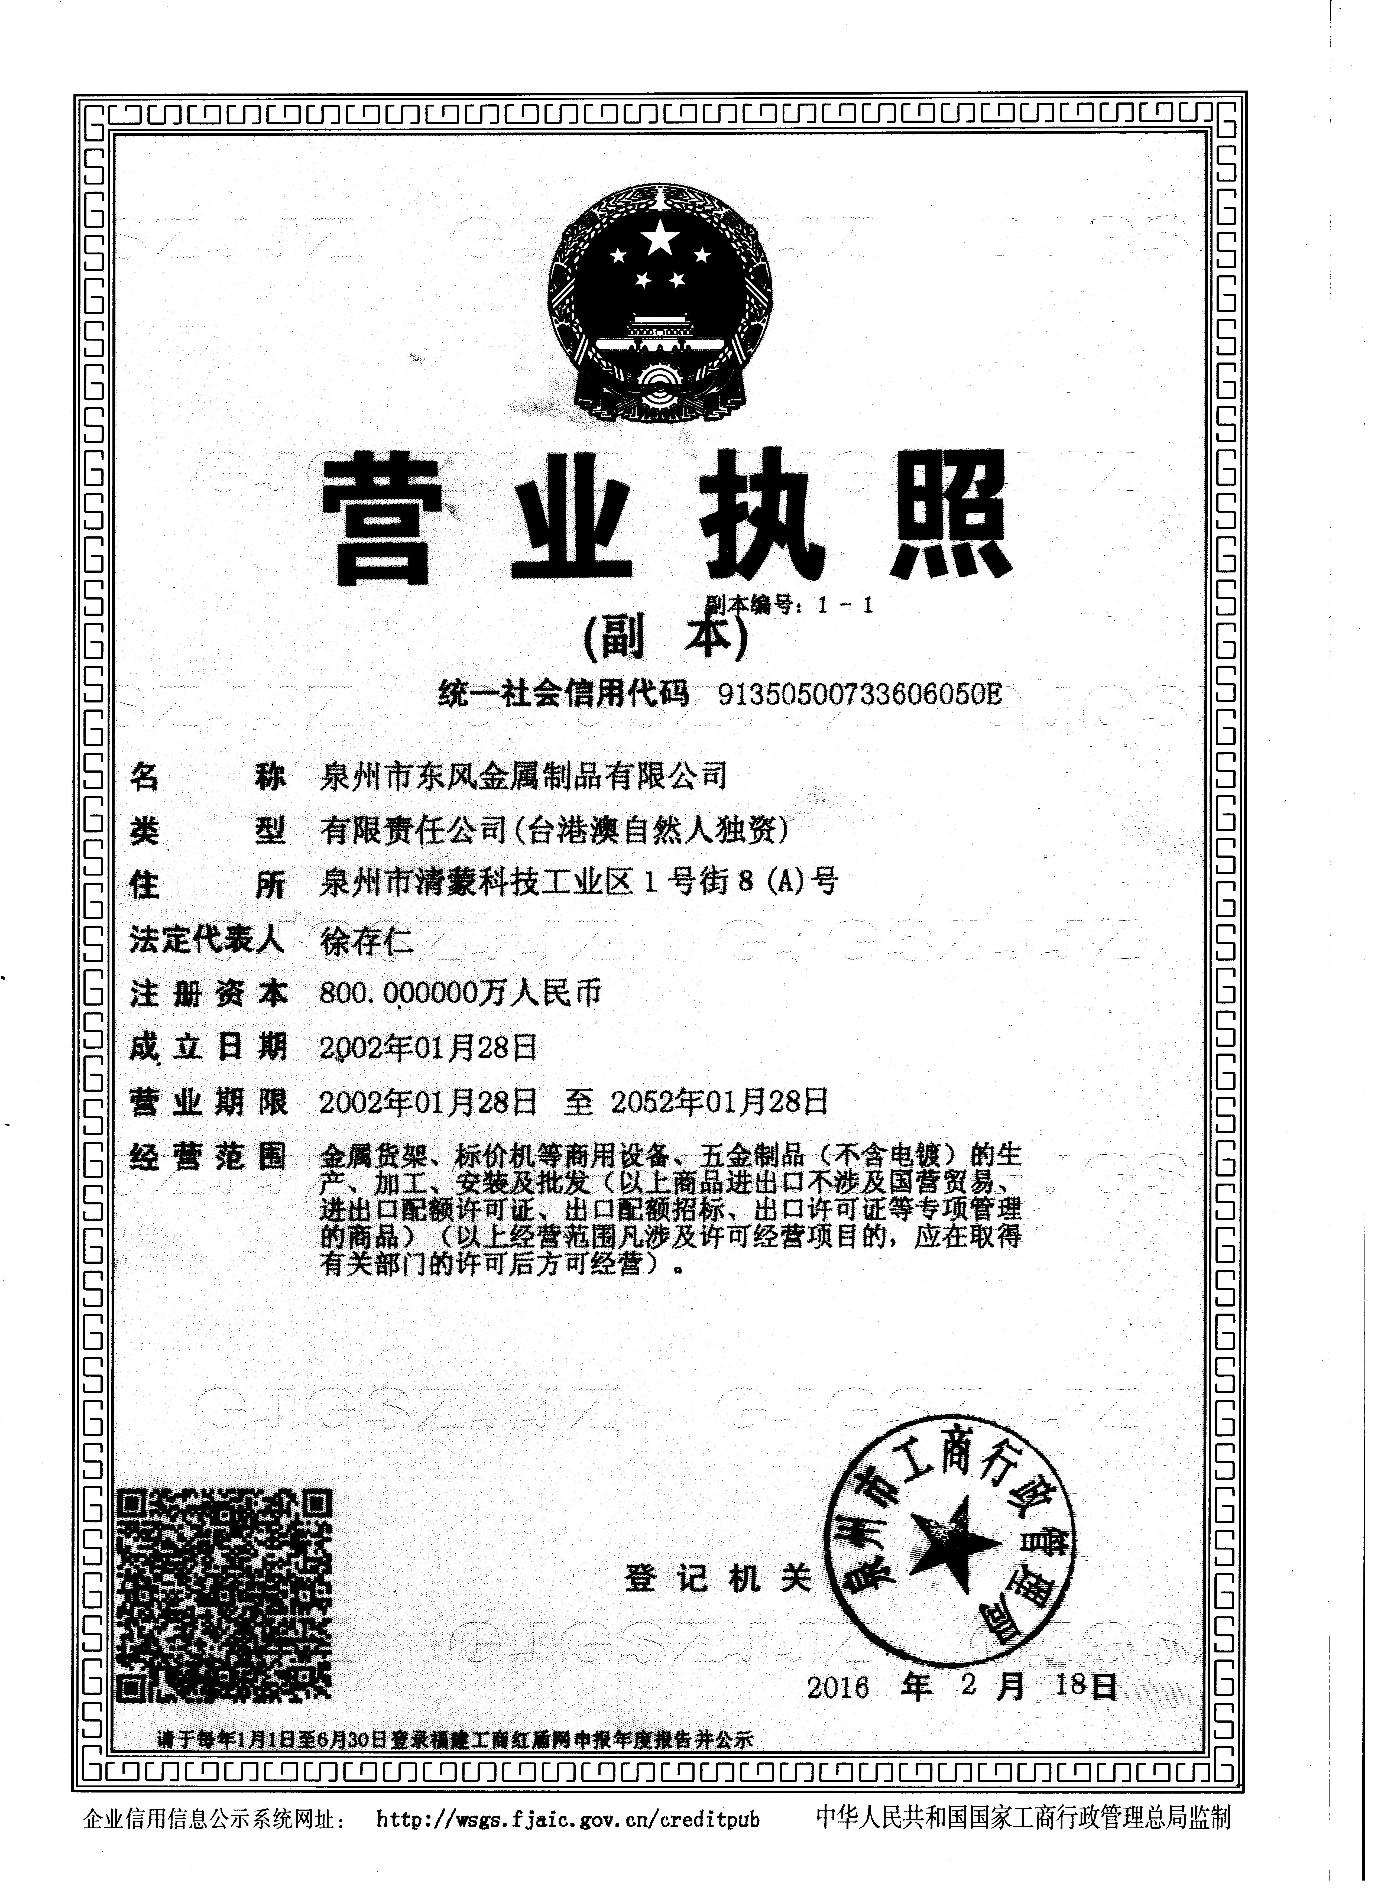 Businesss license